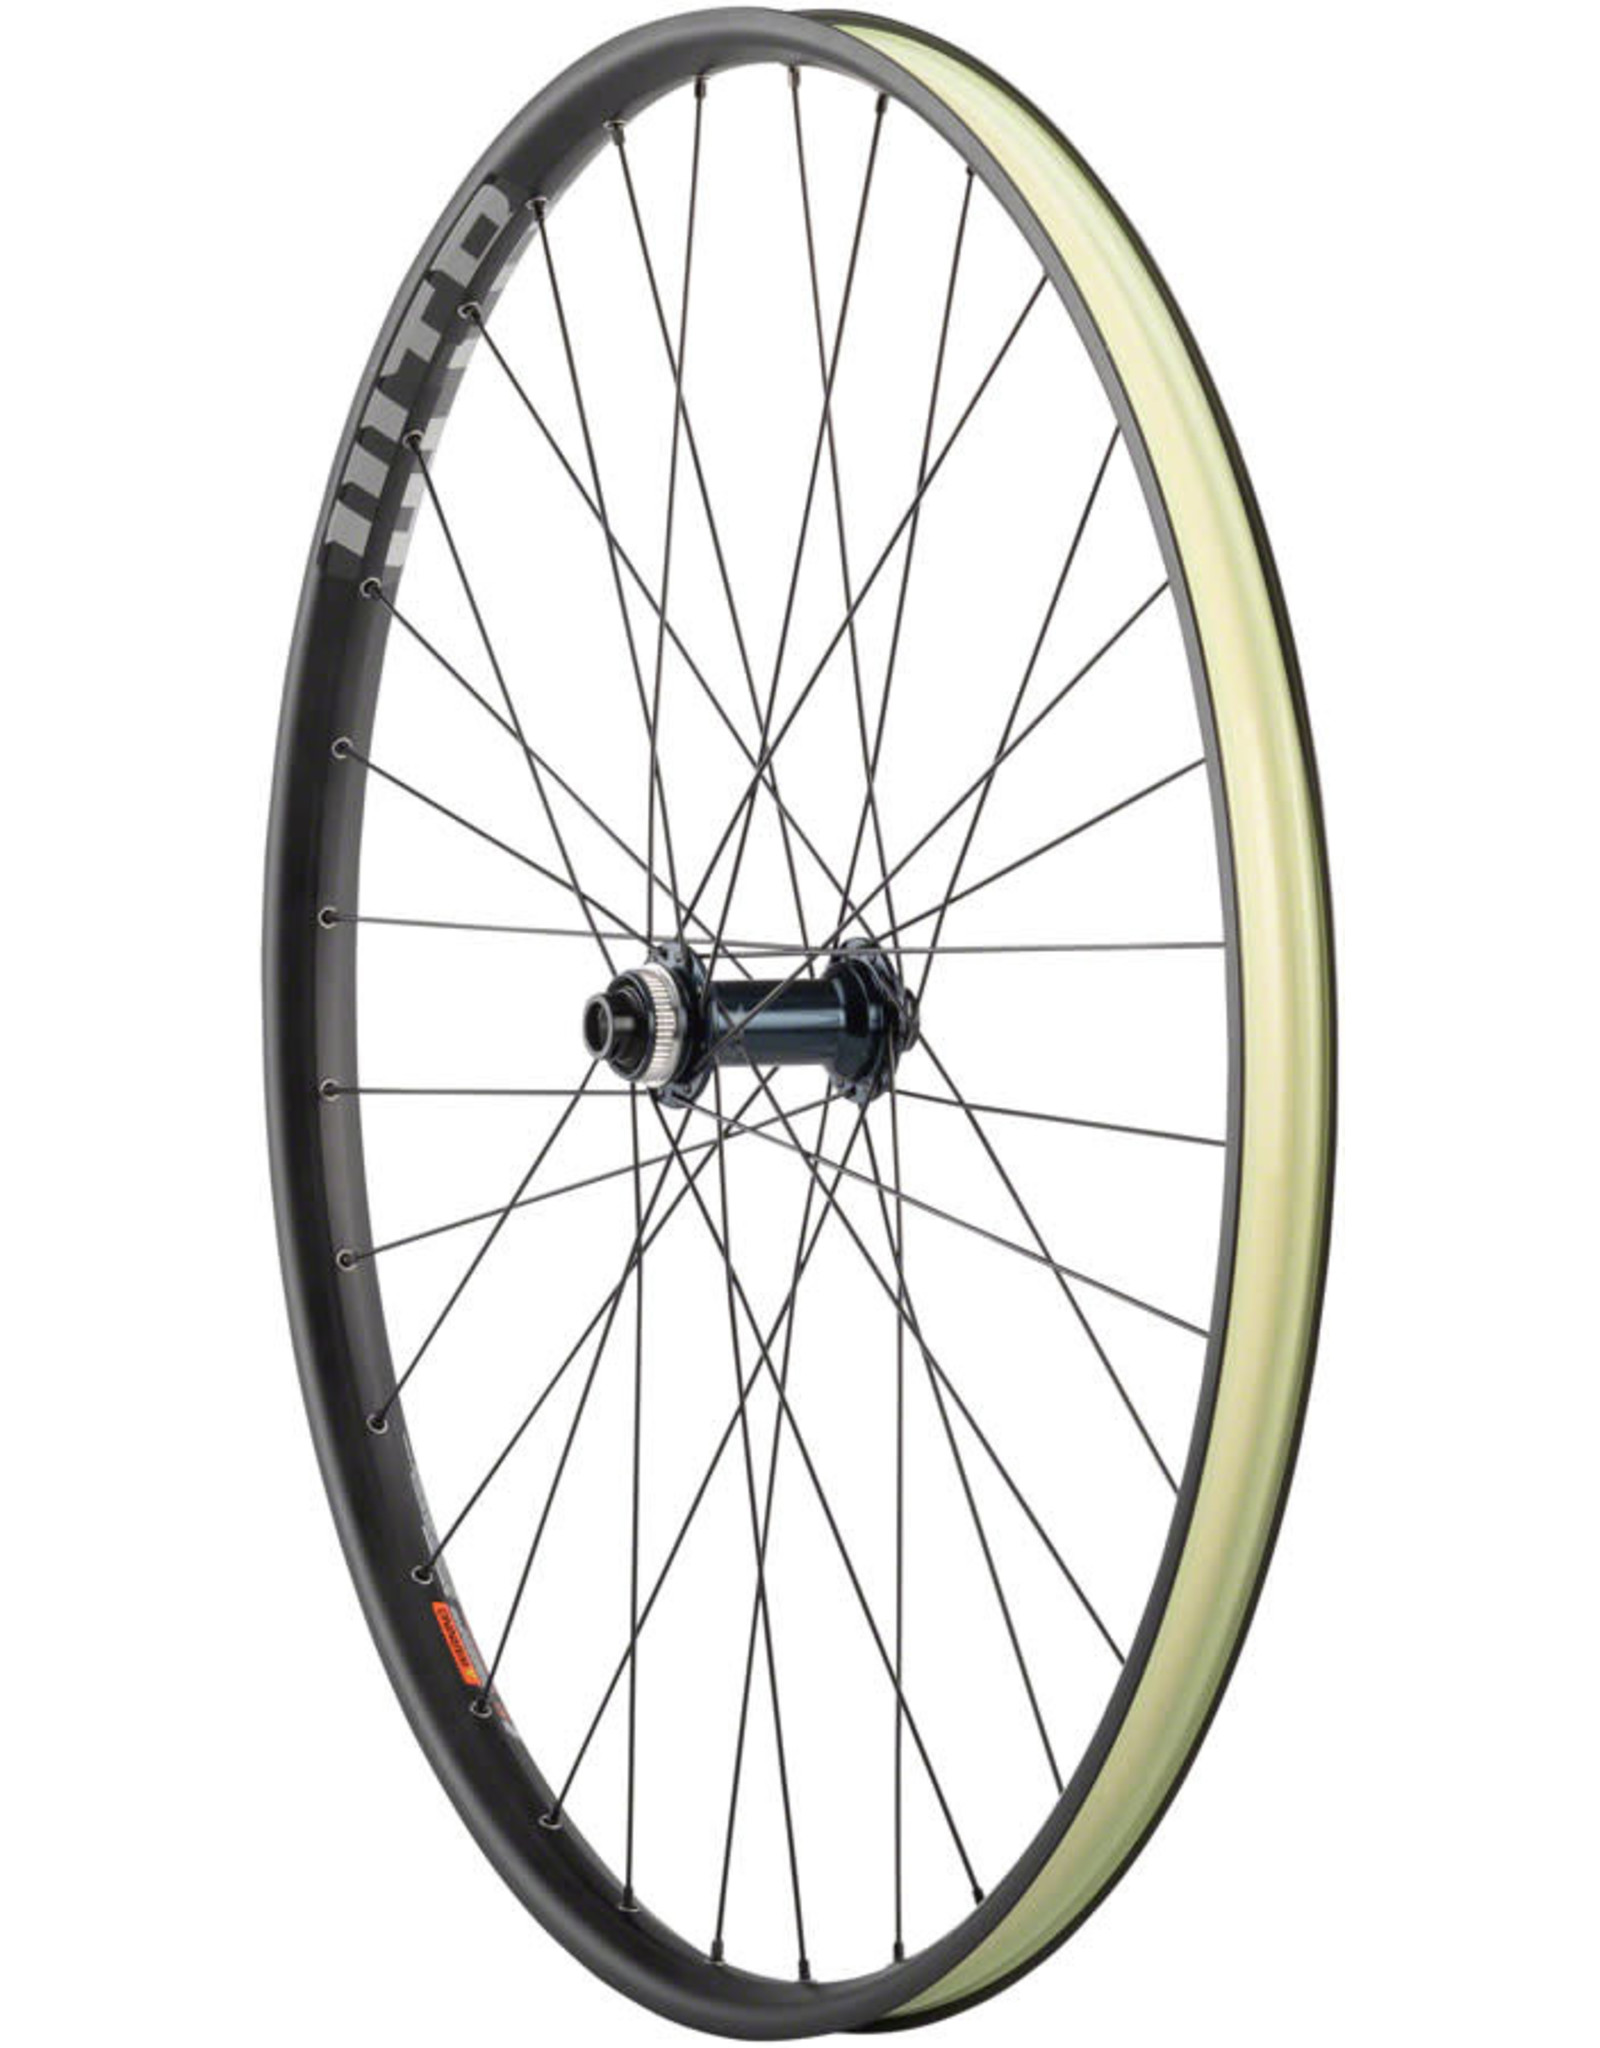 "Quality Wheels SLX/WTB ST Light i29 - 29"", 15 x 110mm Boost, Center-Lock, Black, Front Wheel"